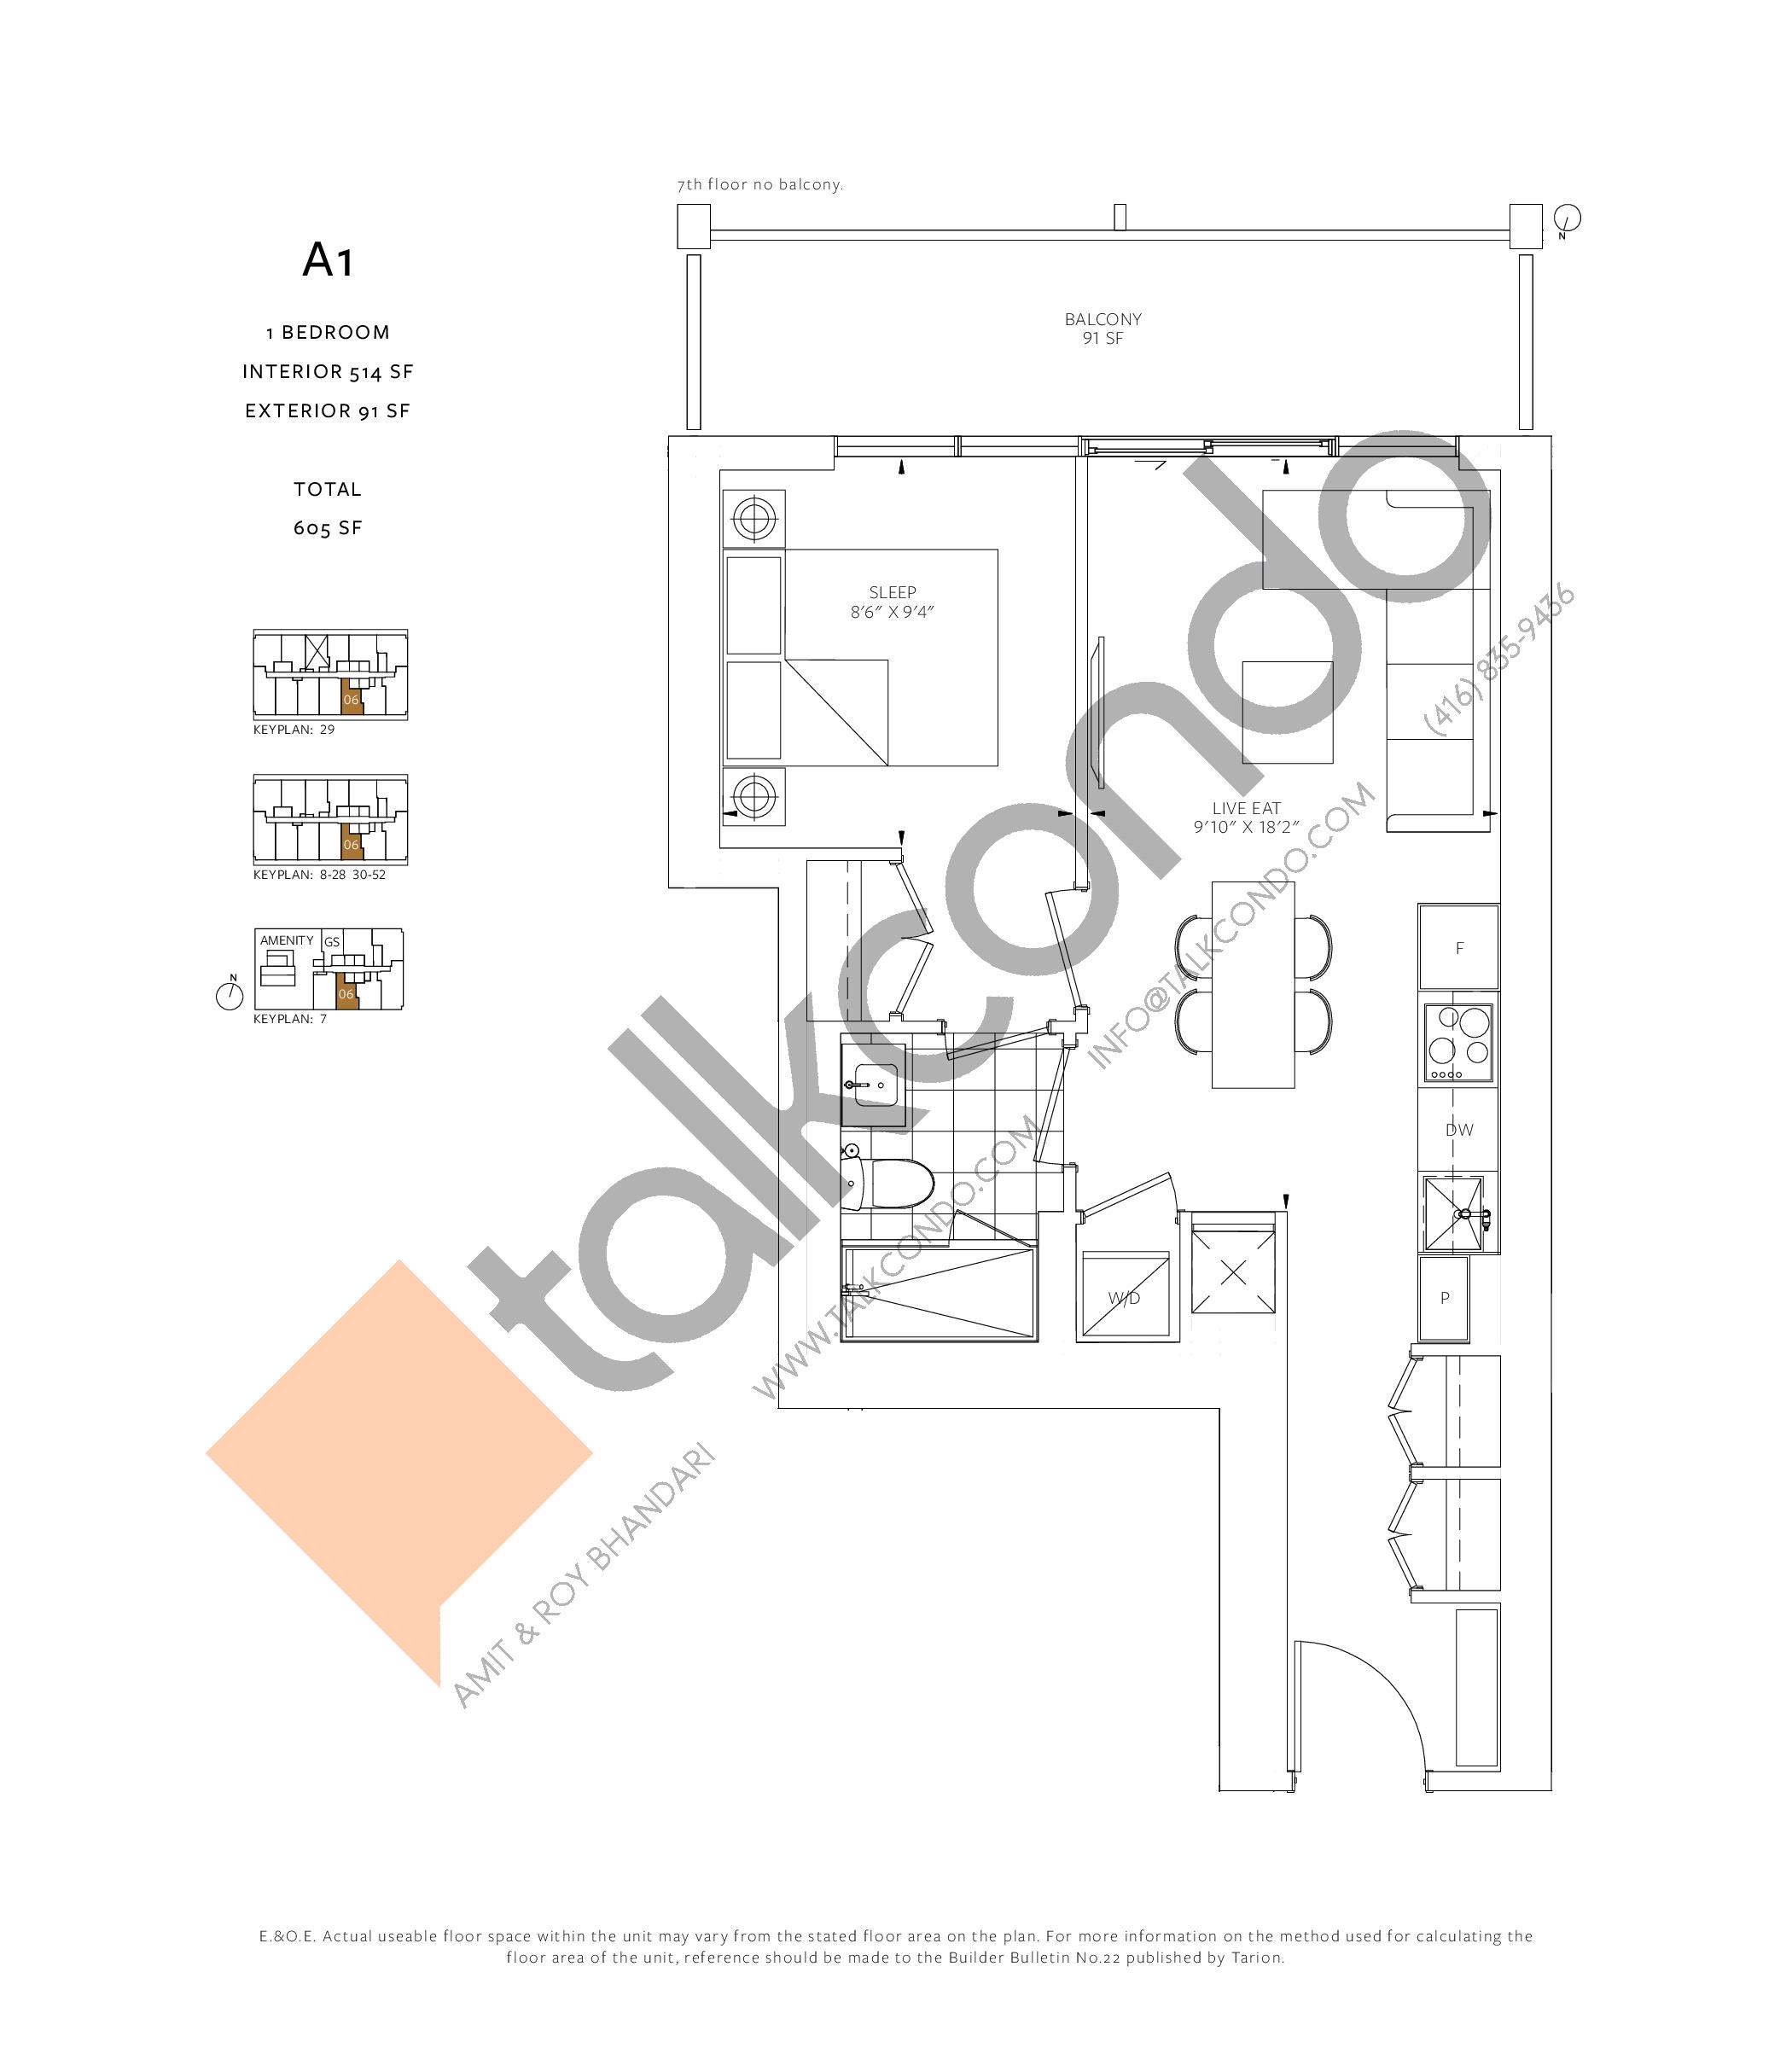 A1 Floor Plan at 88 Queen Condos - 514 sq.ft